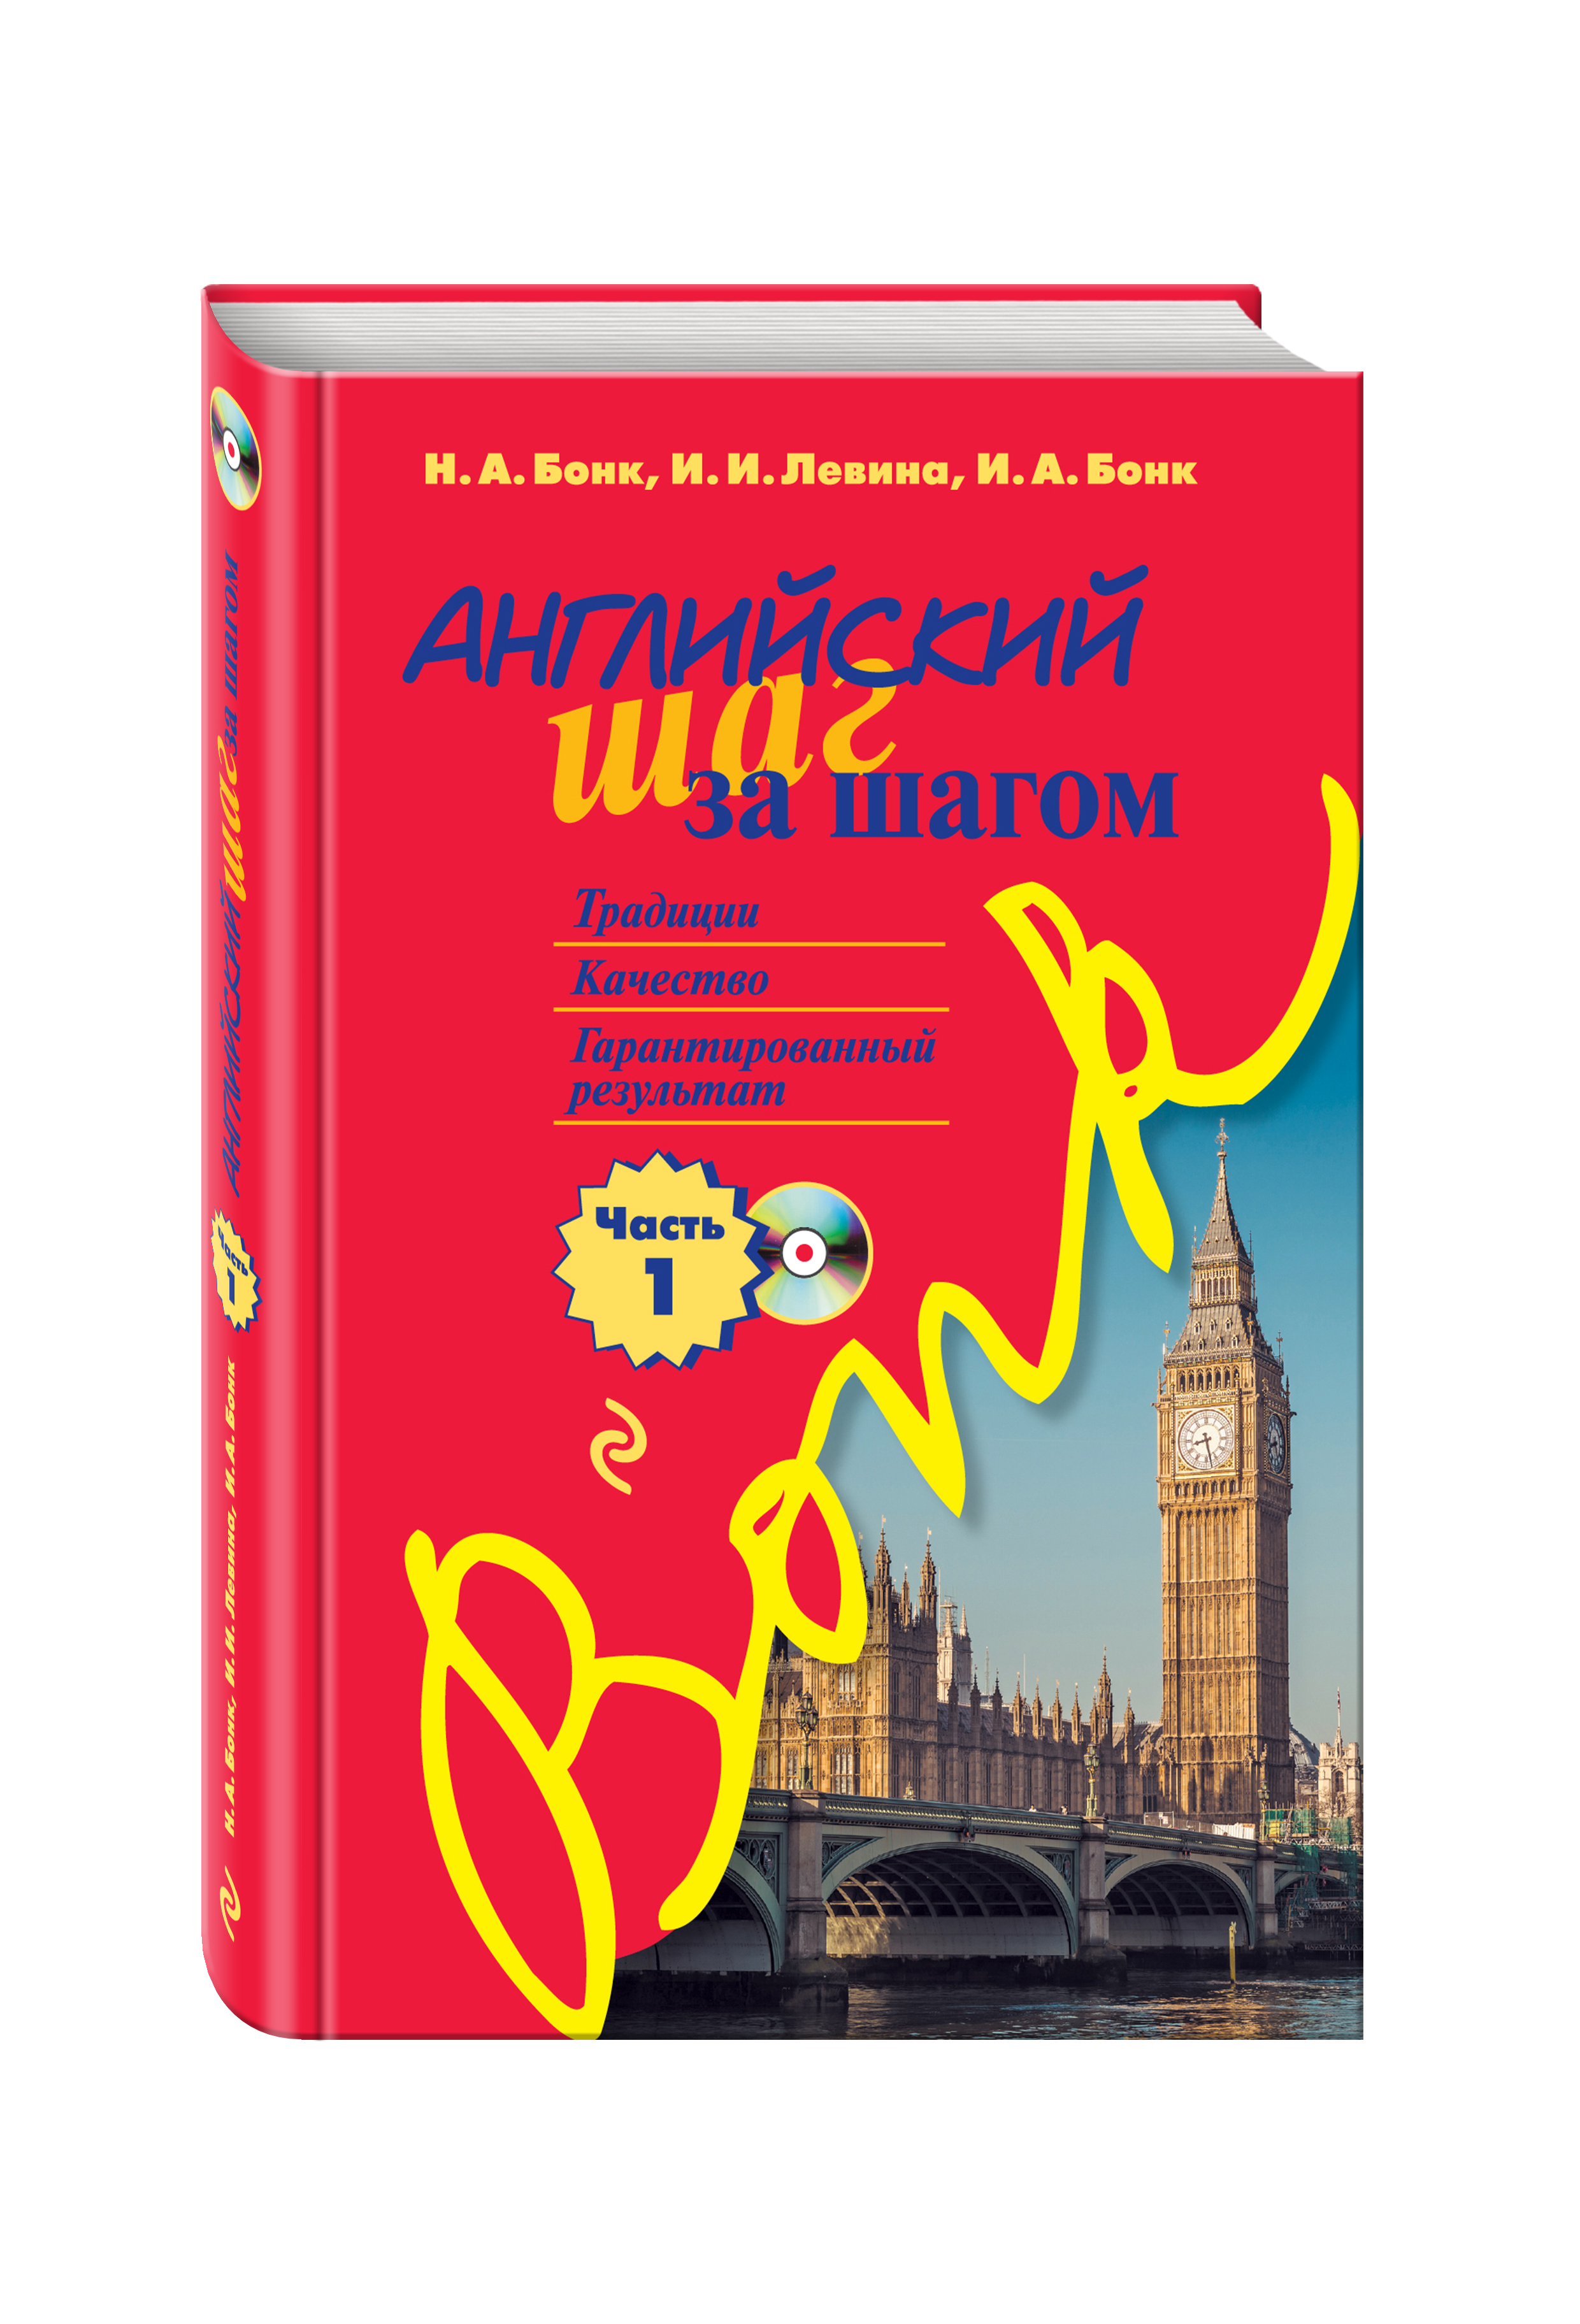 Н.А. Бонк, И.И. Левина, И.А. Бонк Английский шаг за шагом. Часть 1 (+компакт-диск MP3)